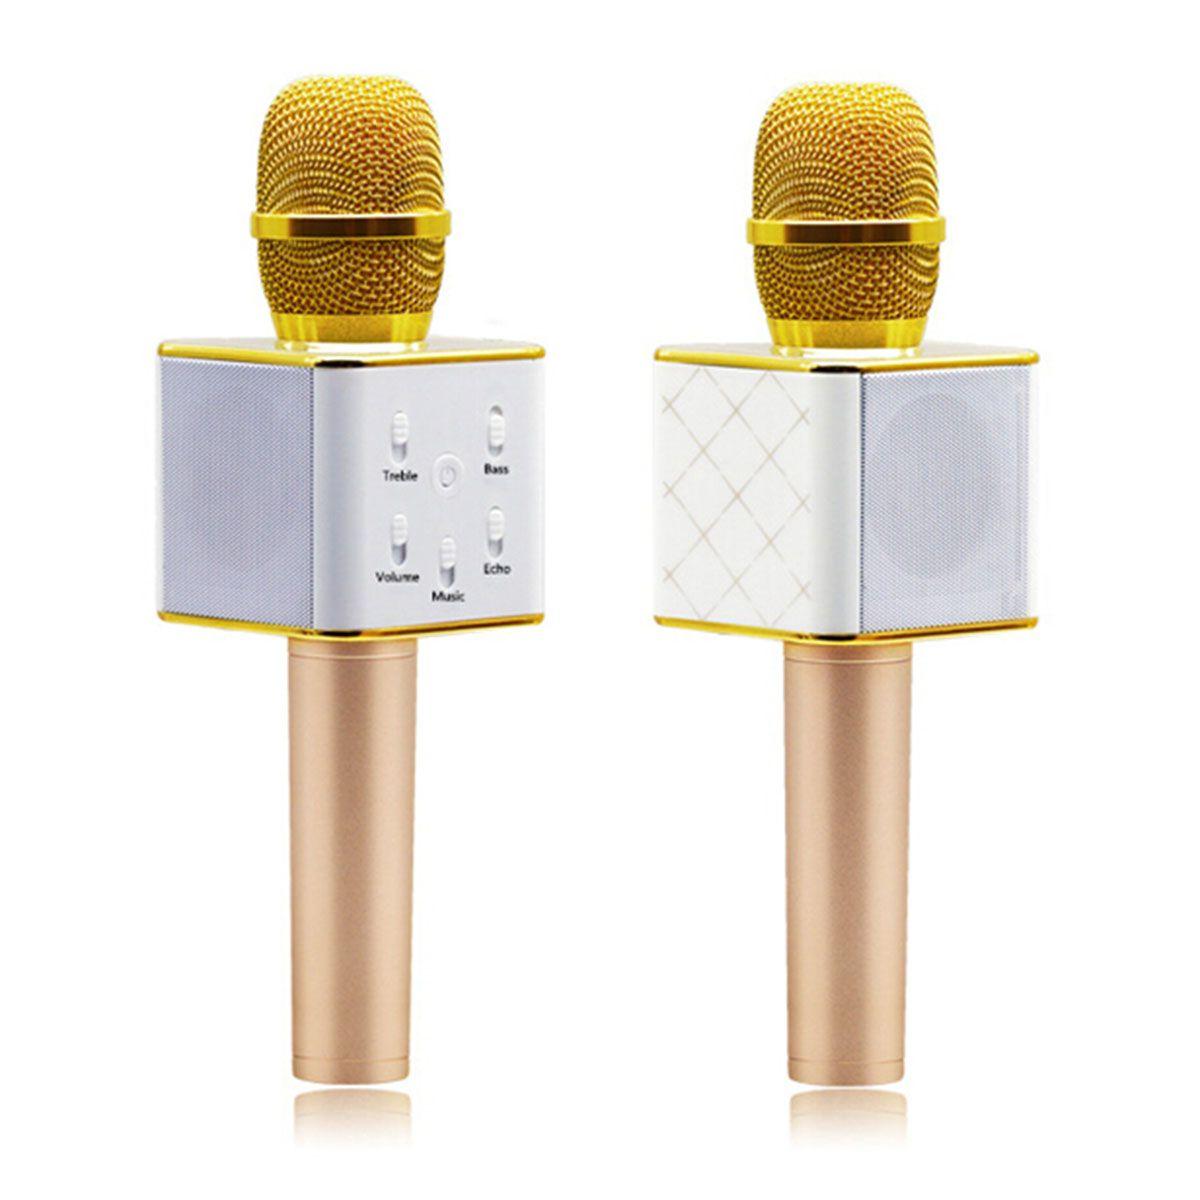 Q7 Micrófono de mano Bluetooth Wireless KTV con altavoz MIC MICROFONO Handheld para smartphone Portable Karaoke Player 0802218